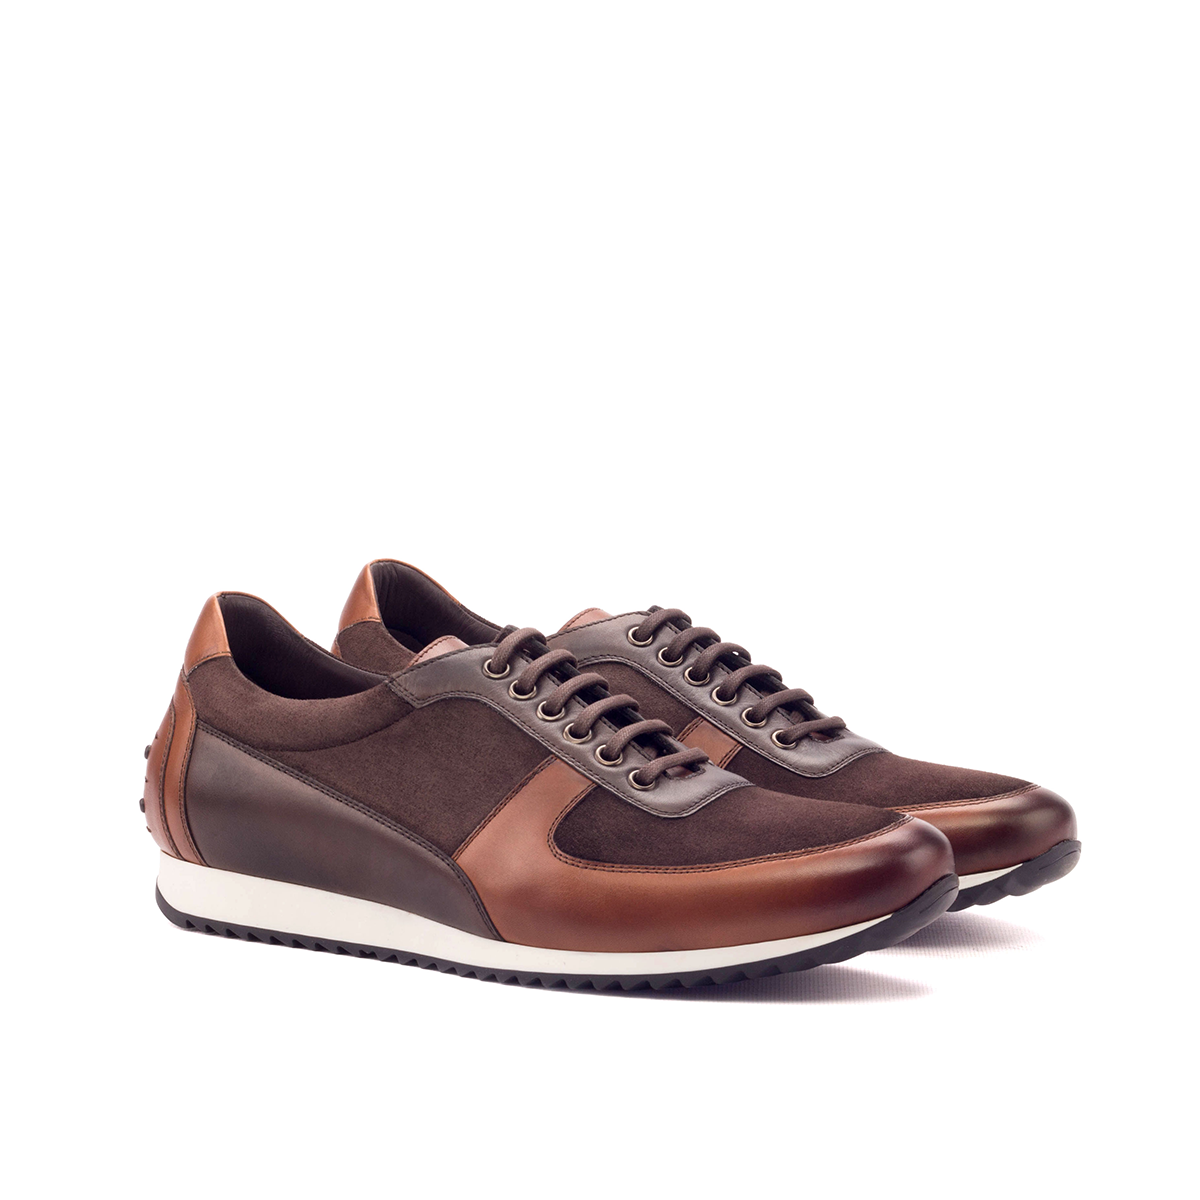 LEO Brown hand painted corsini sneakers